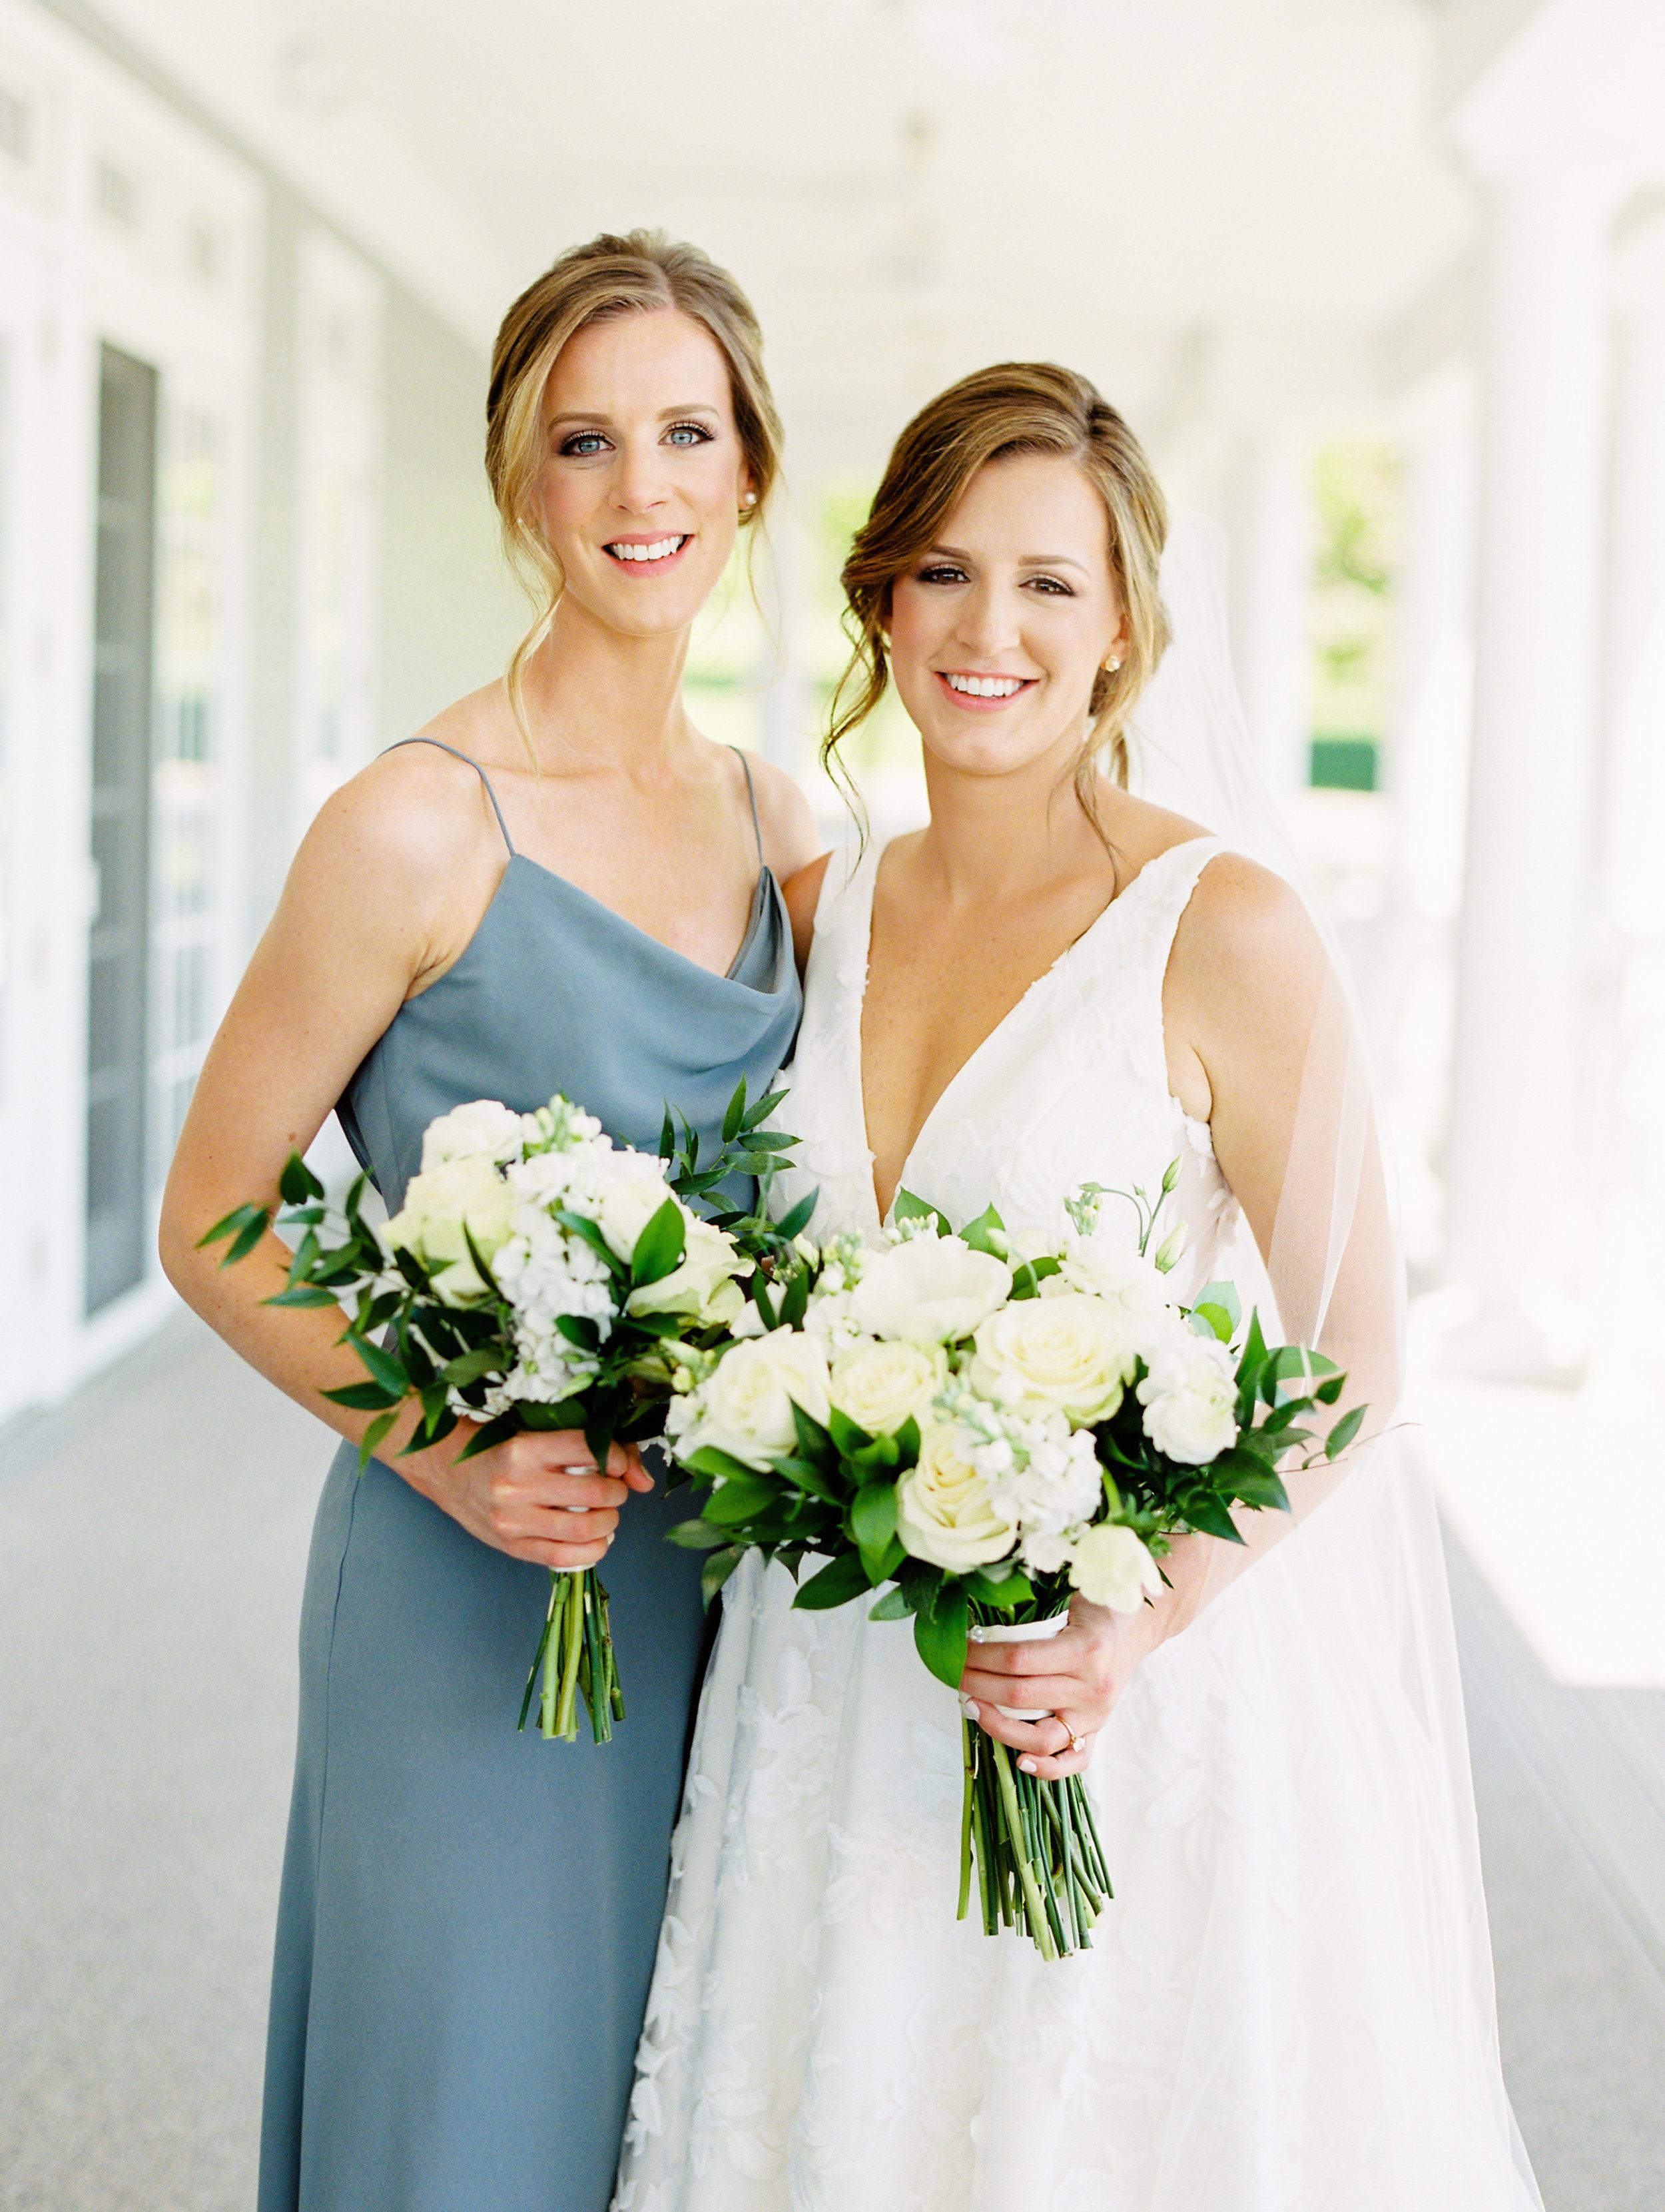 DeGuilio+Wedding+Bridal+Partyf-10.jpg